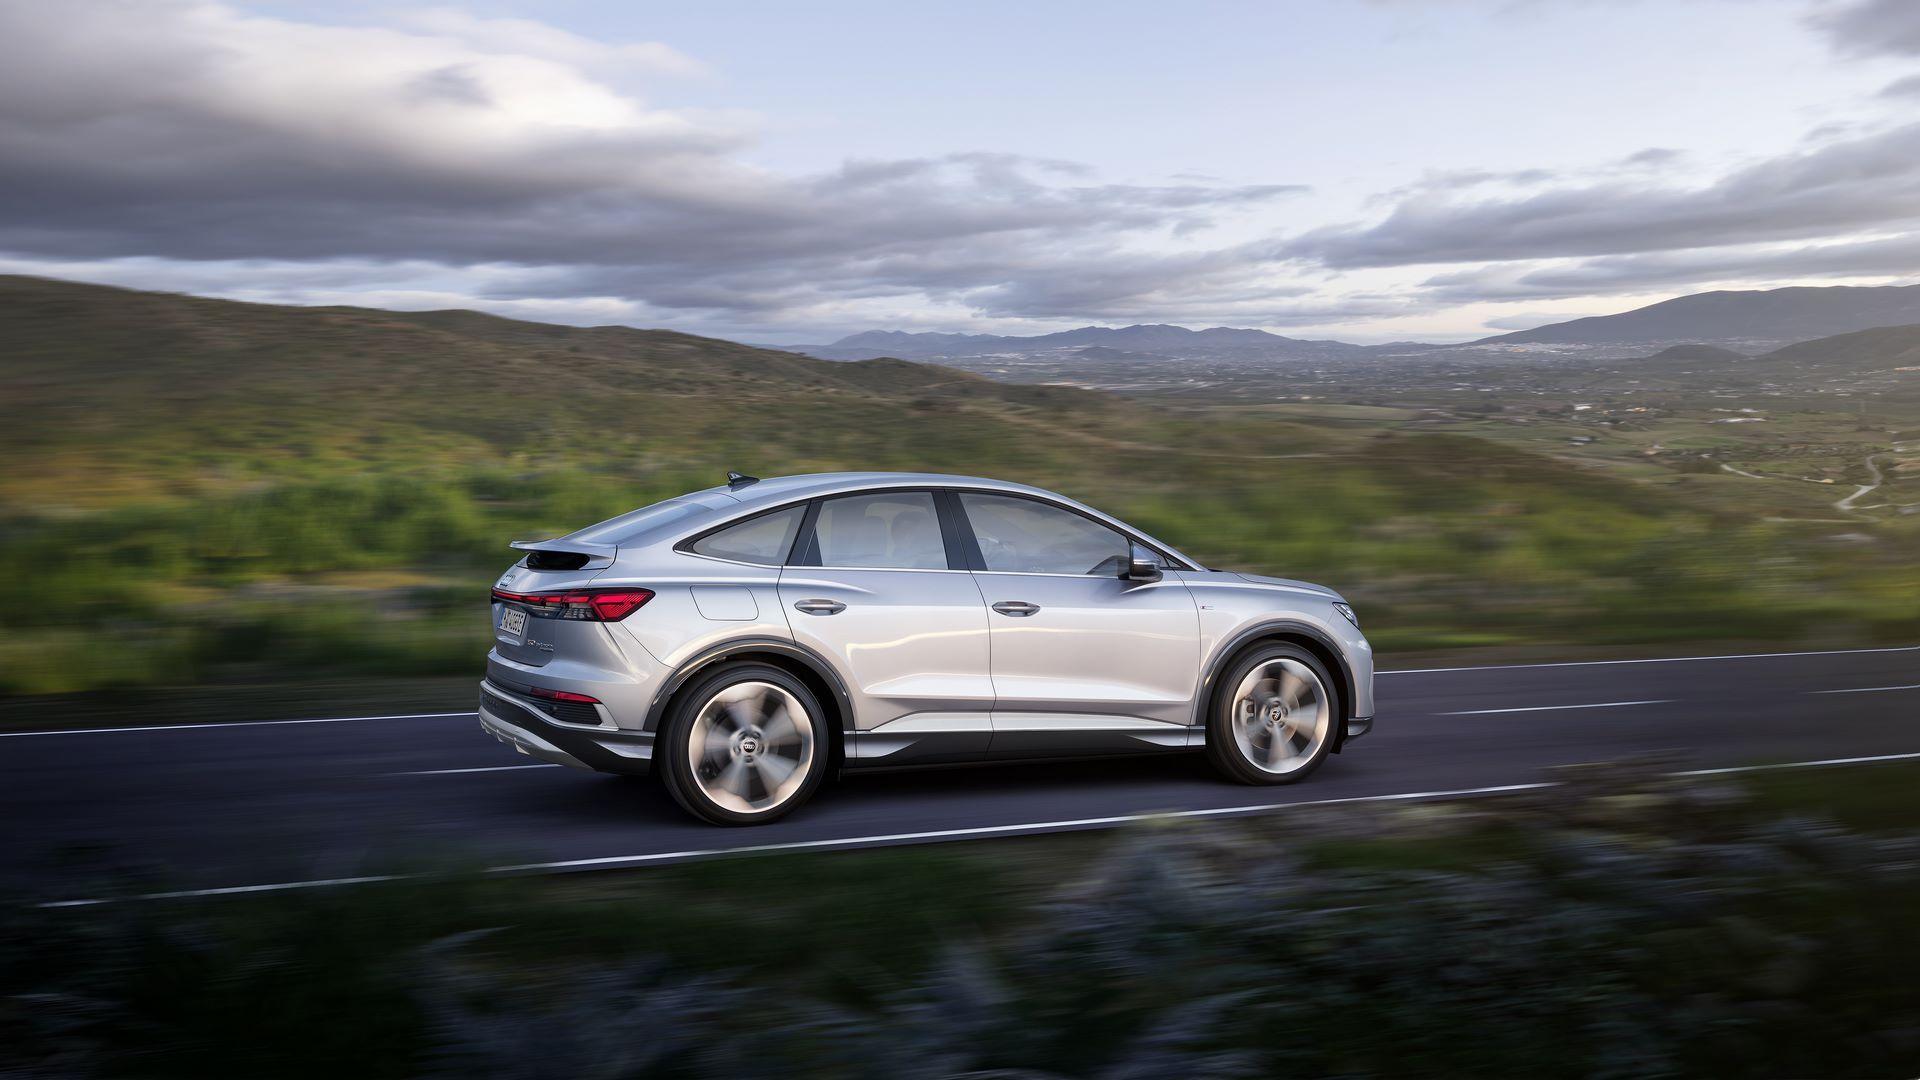 Audi-Q4-e-tron-and-Q4-e-tron-Sportback-40